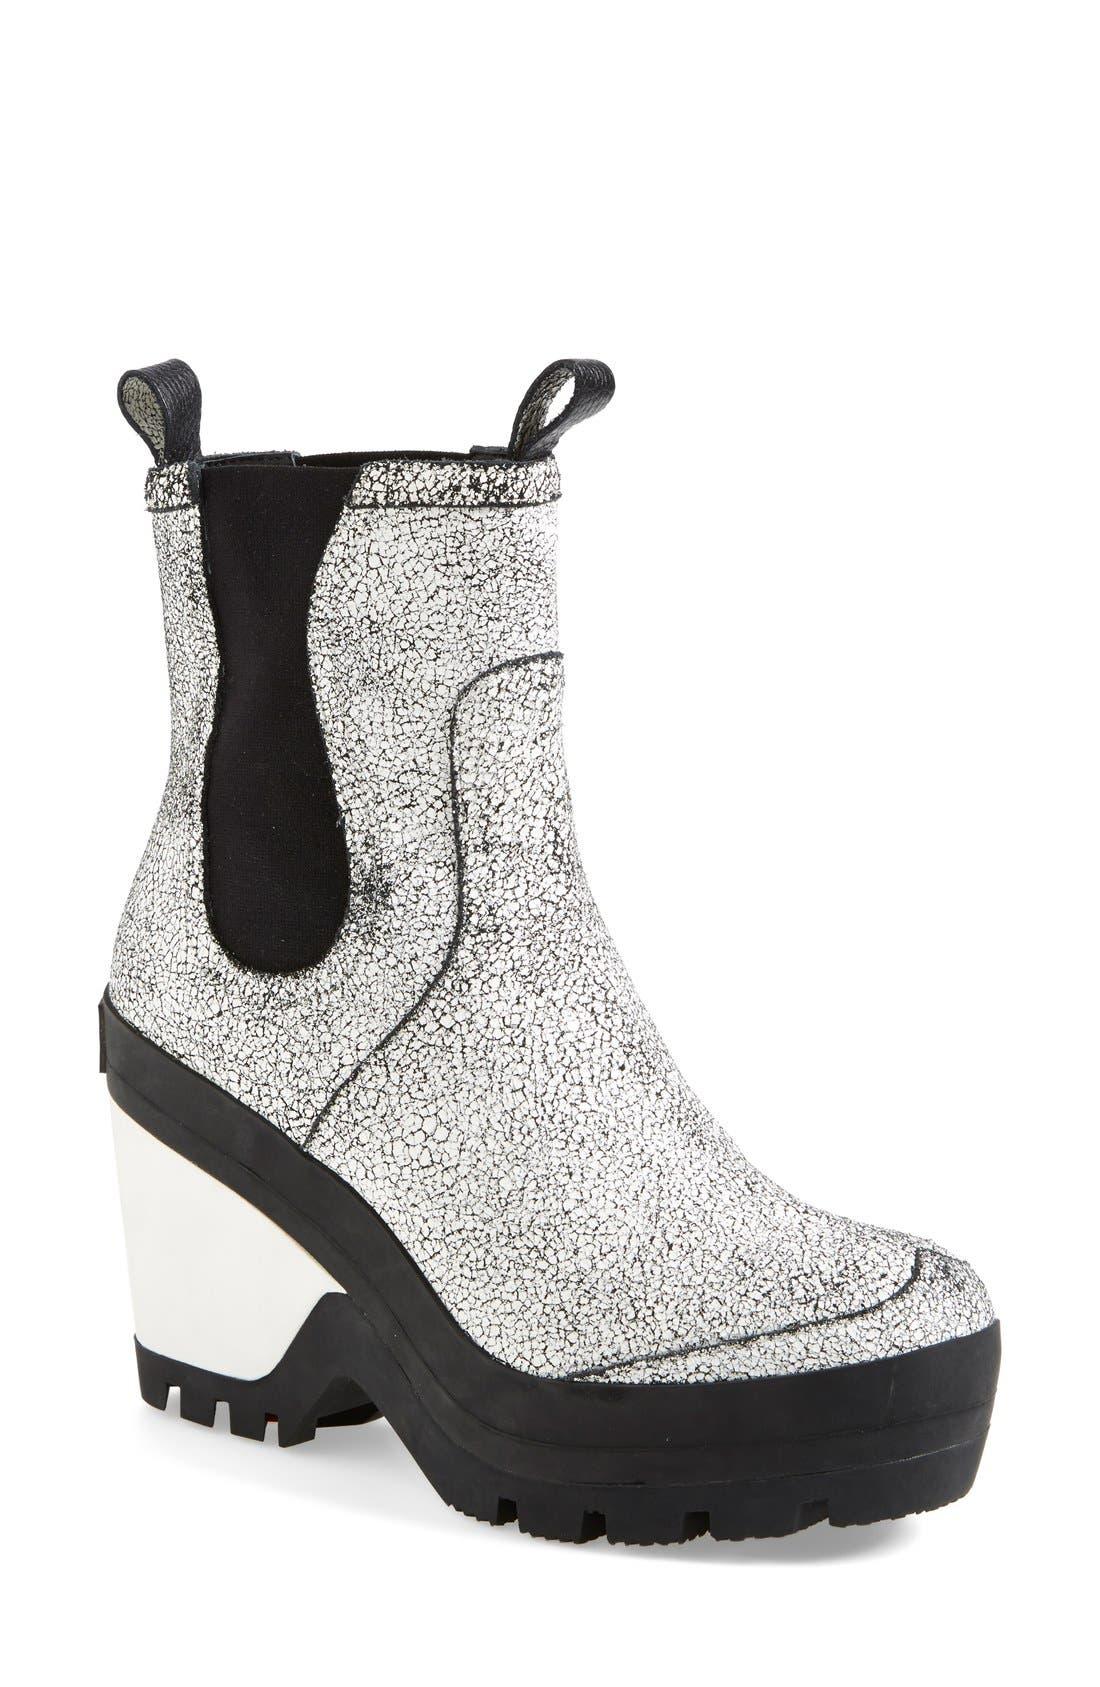 Main Image - Hunter Crackled Leather Chelsea Rain Boot (Women)